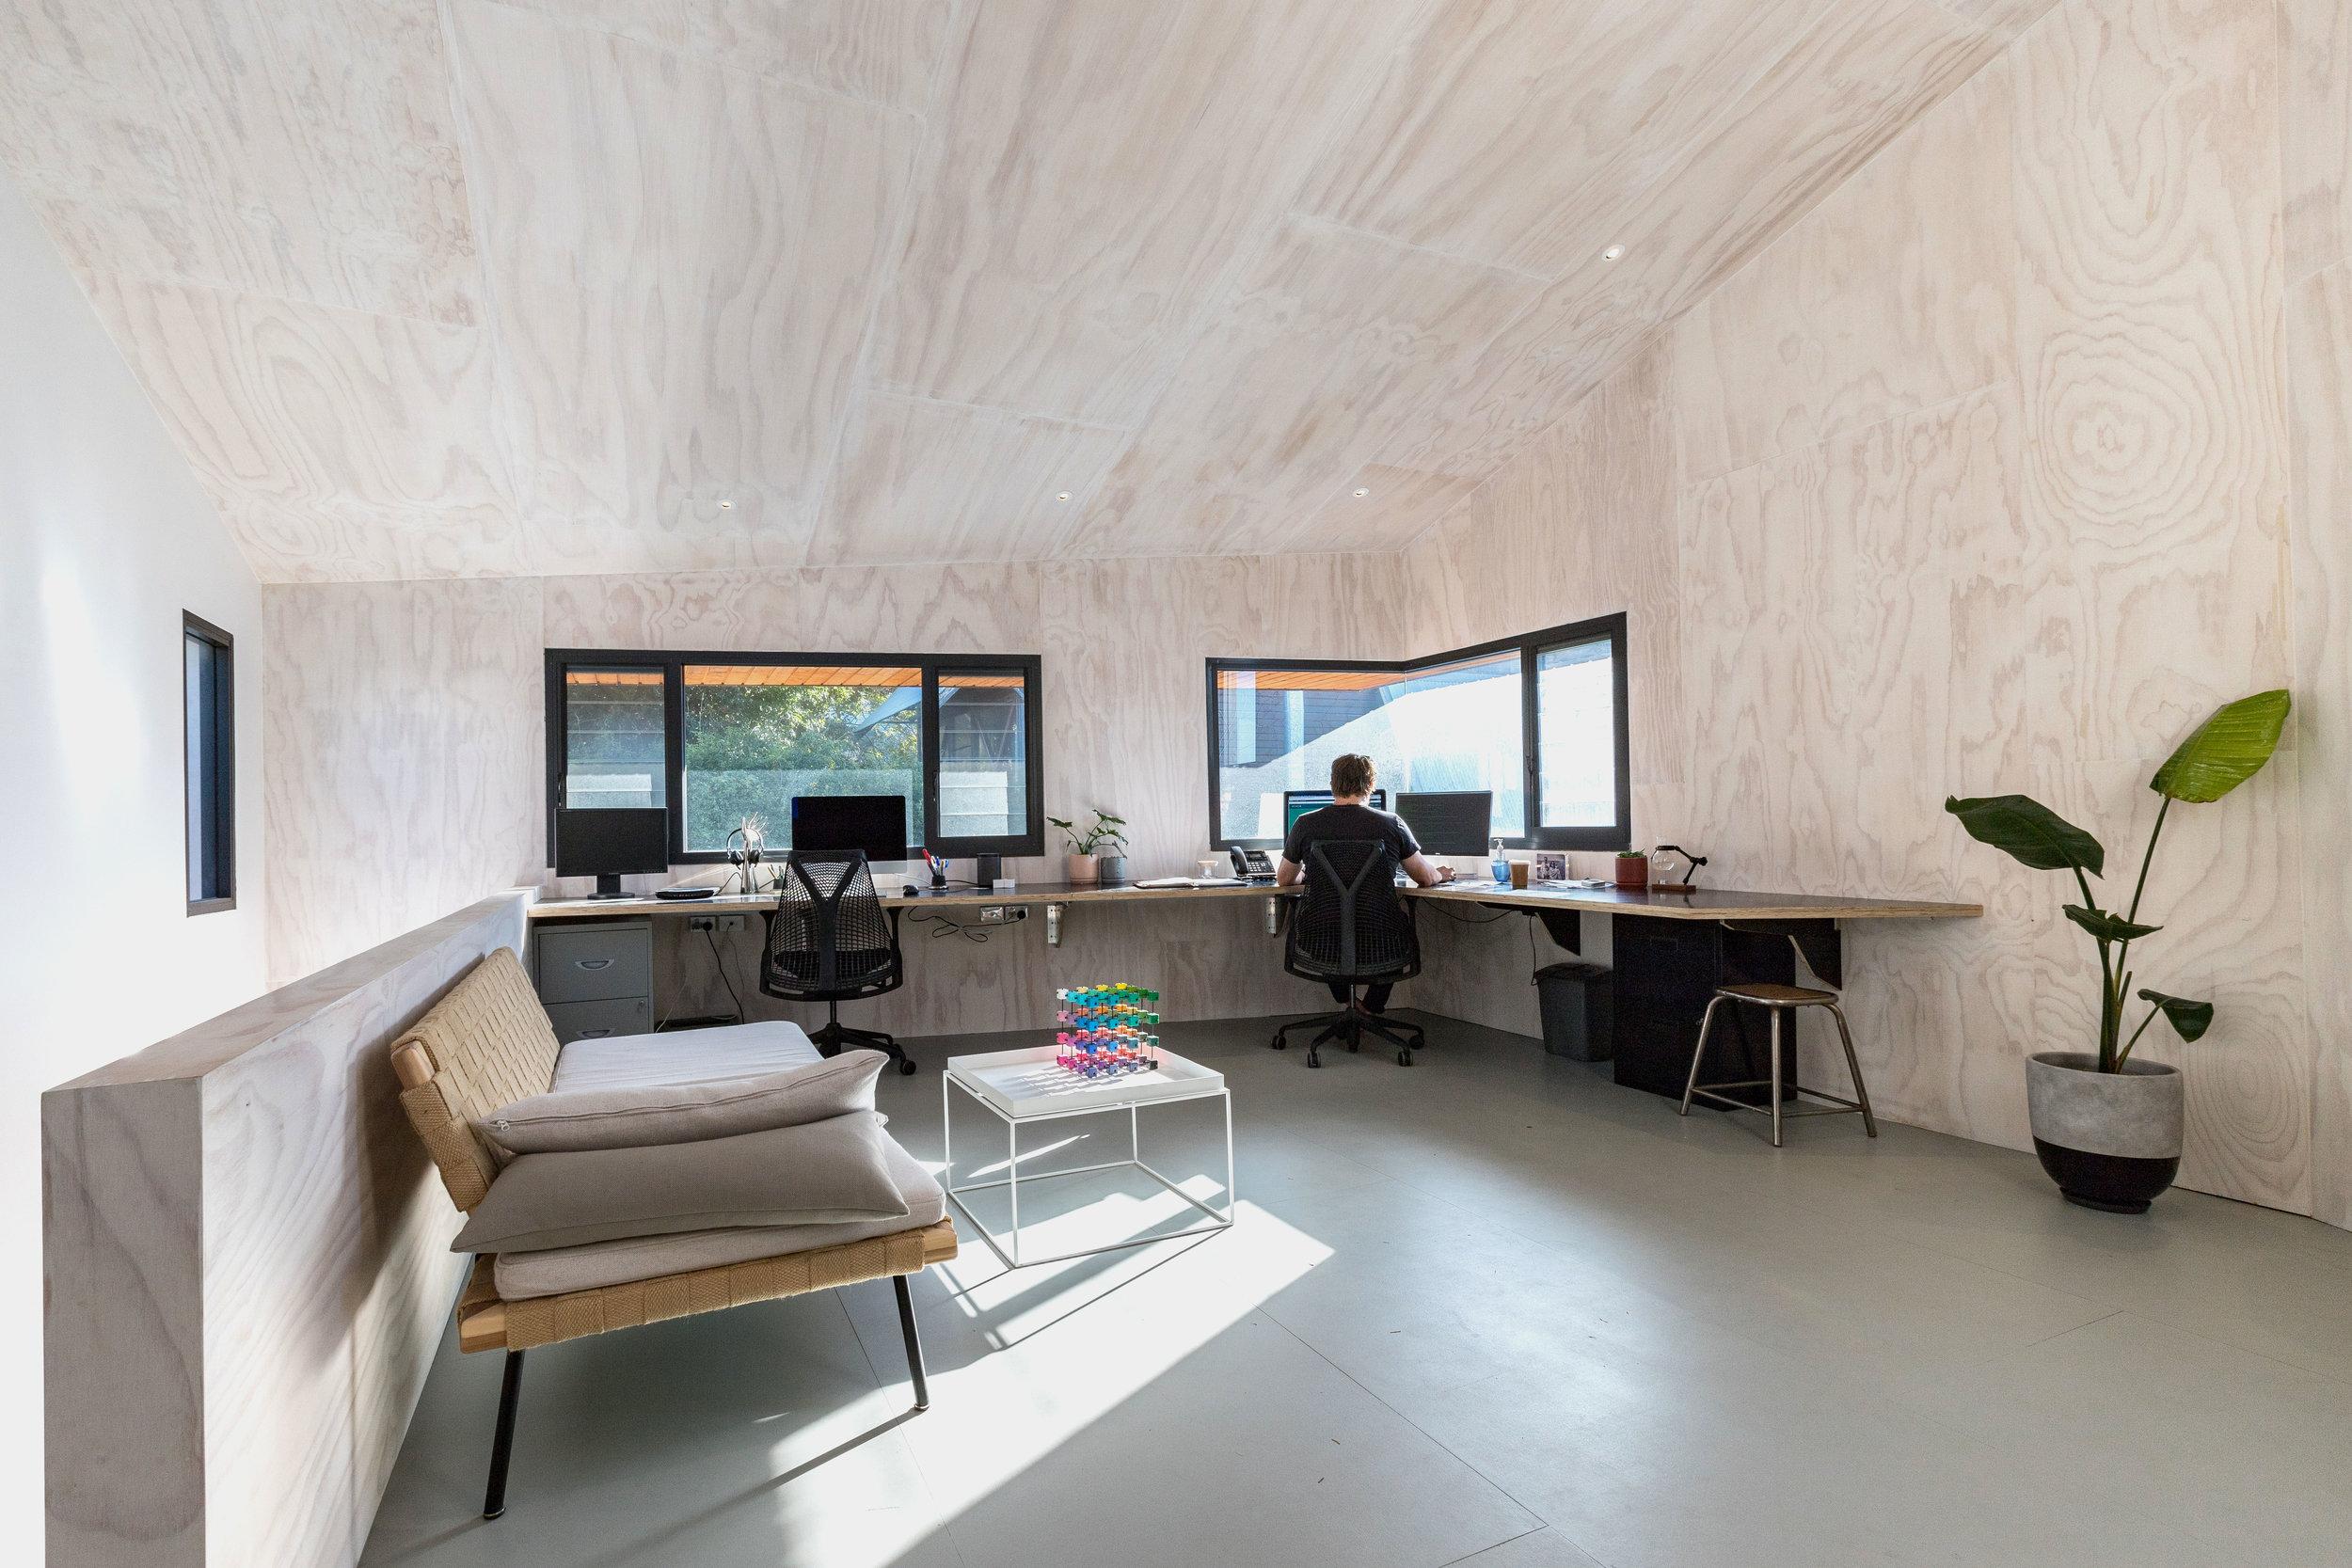 3476-small_Beach Office_Braham Architects_Nicholas Putrasia_07.jpg